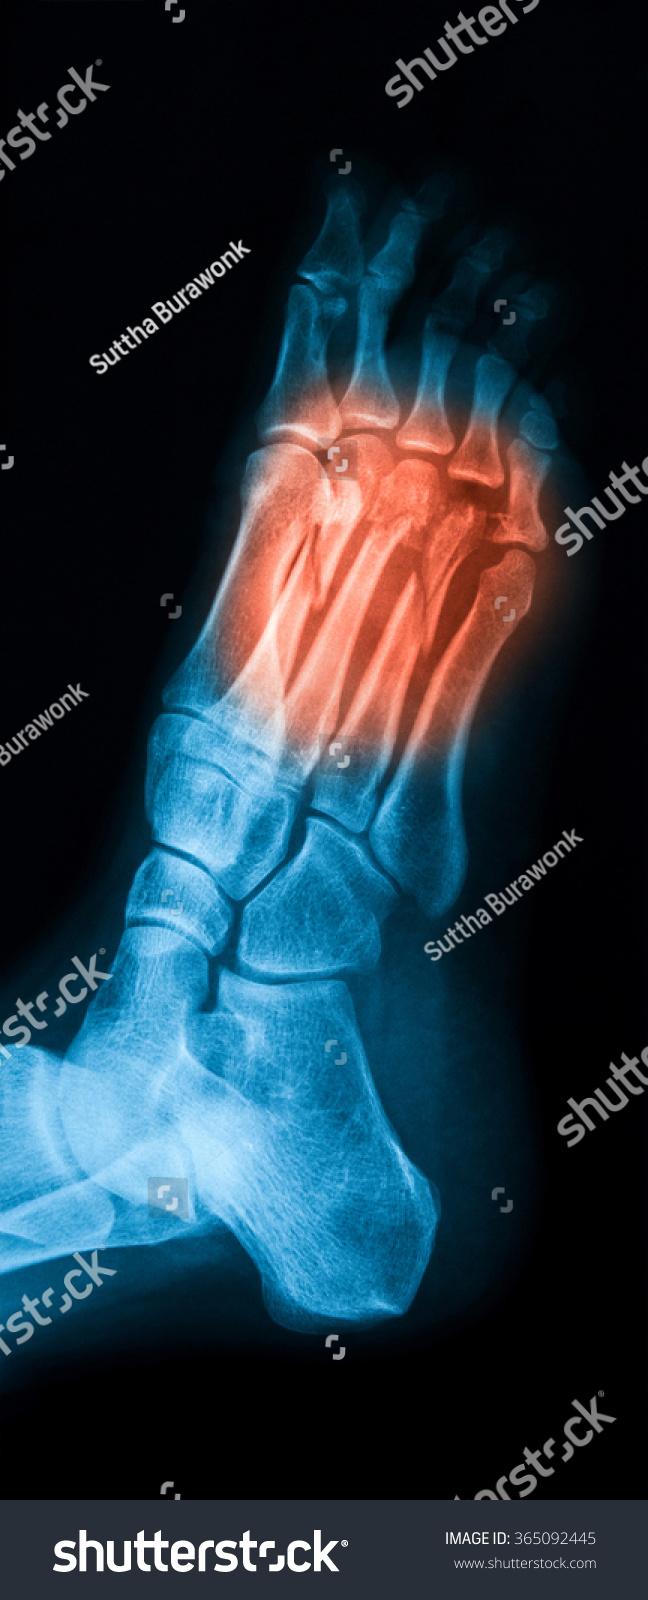 Xray Image Foot Showing Metatarsal Bone Stock Photo (Edit Now ...